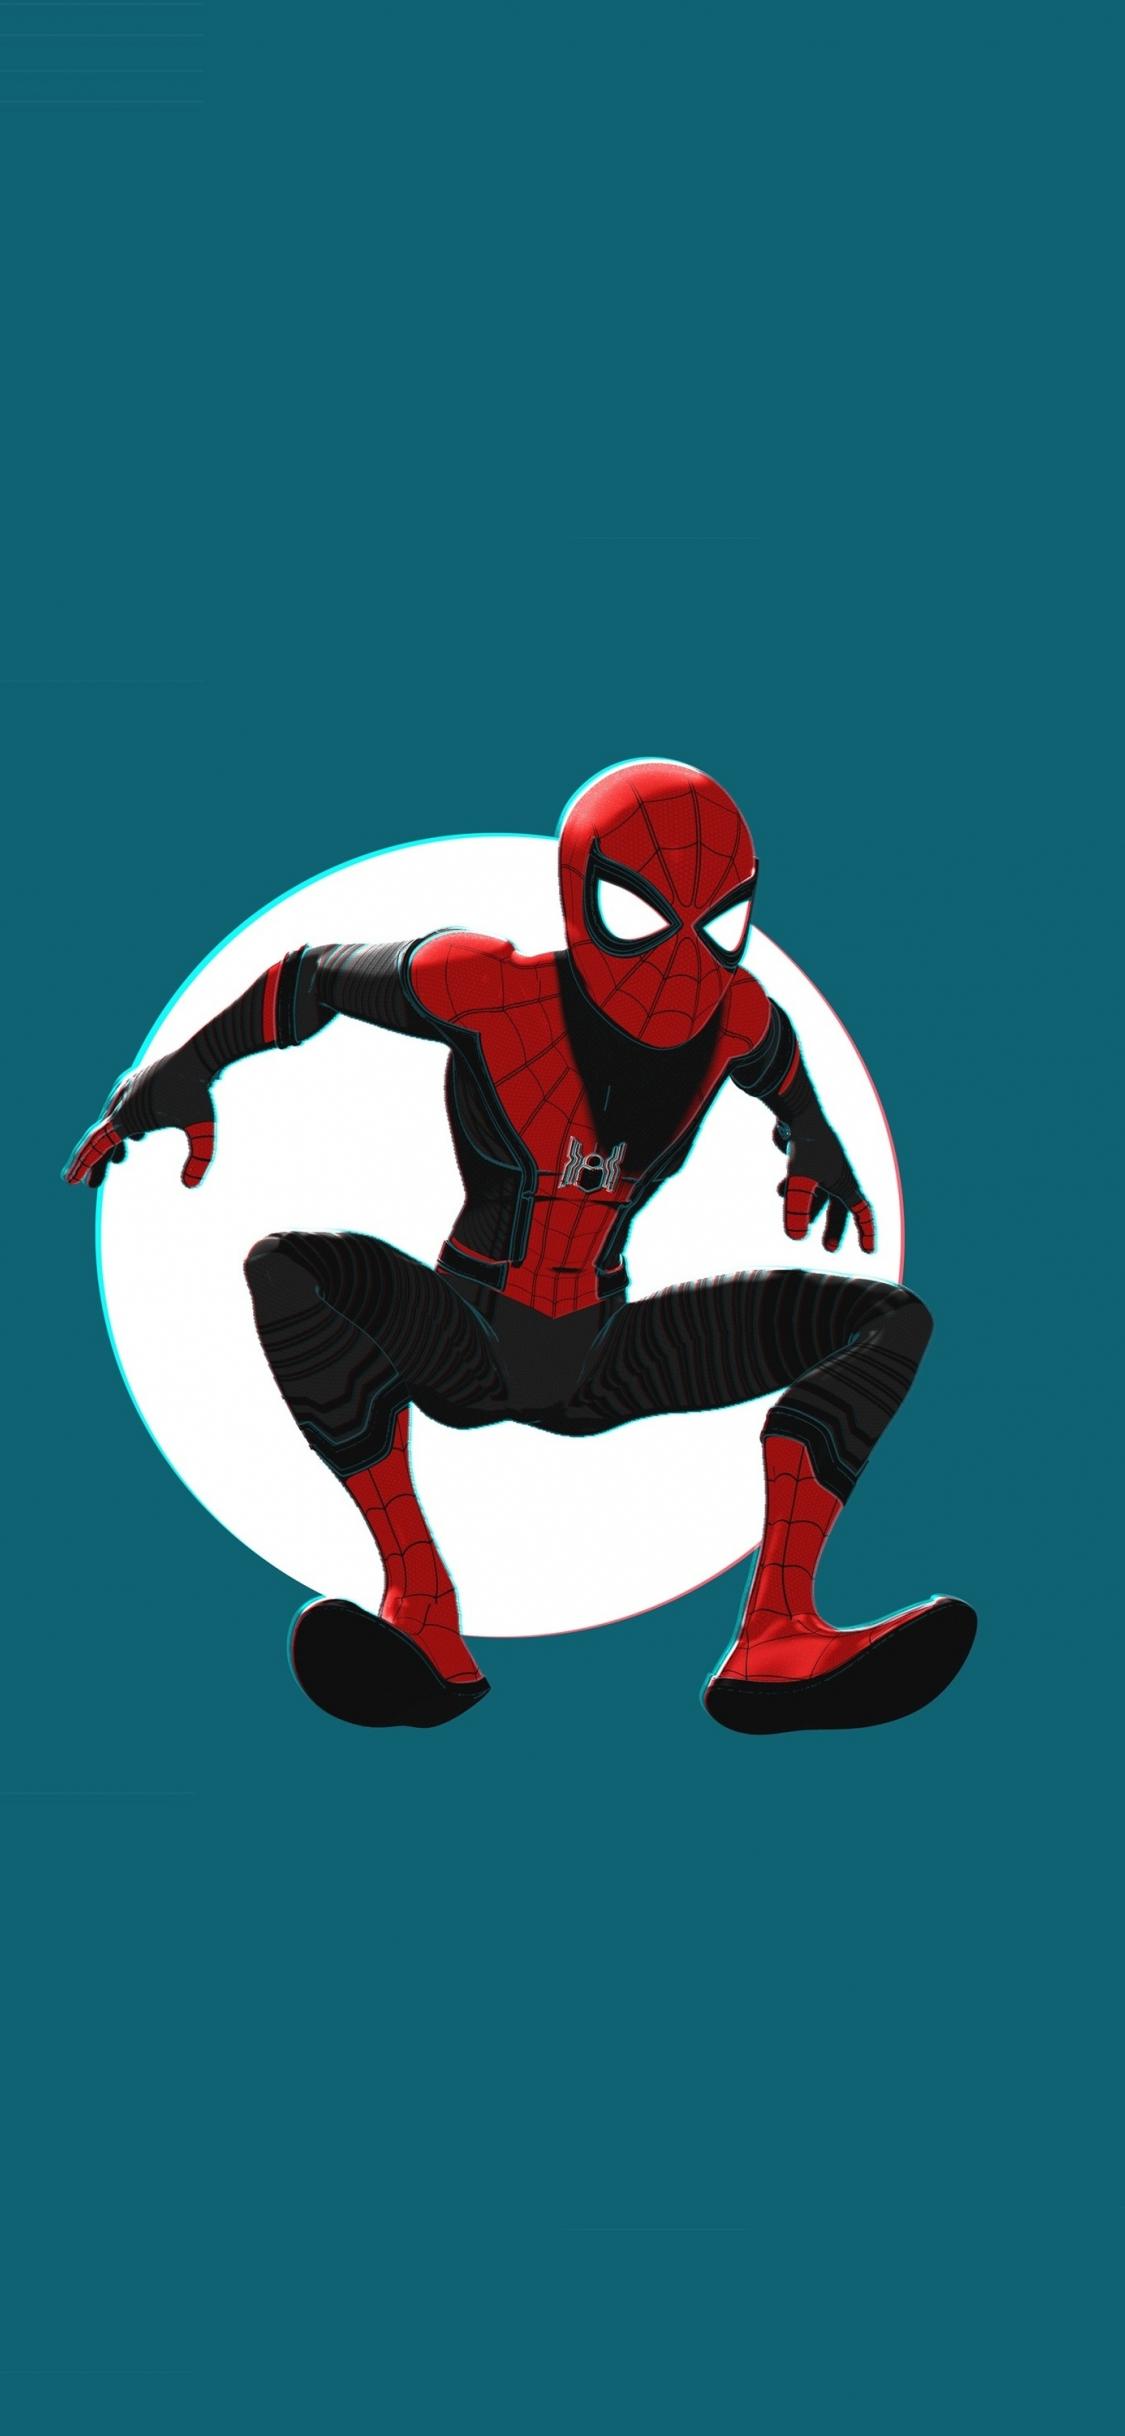 Download 1125x2436 Wallpaper Spider Man Into The Spider Verse